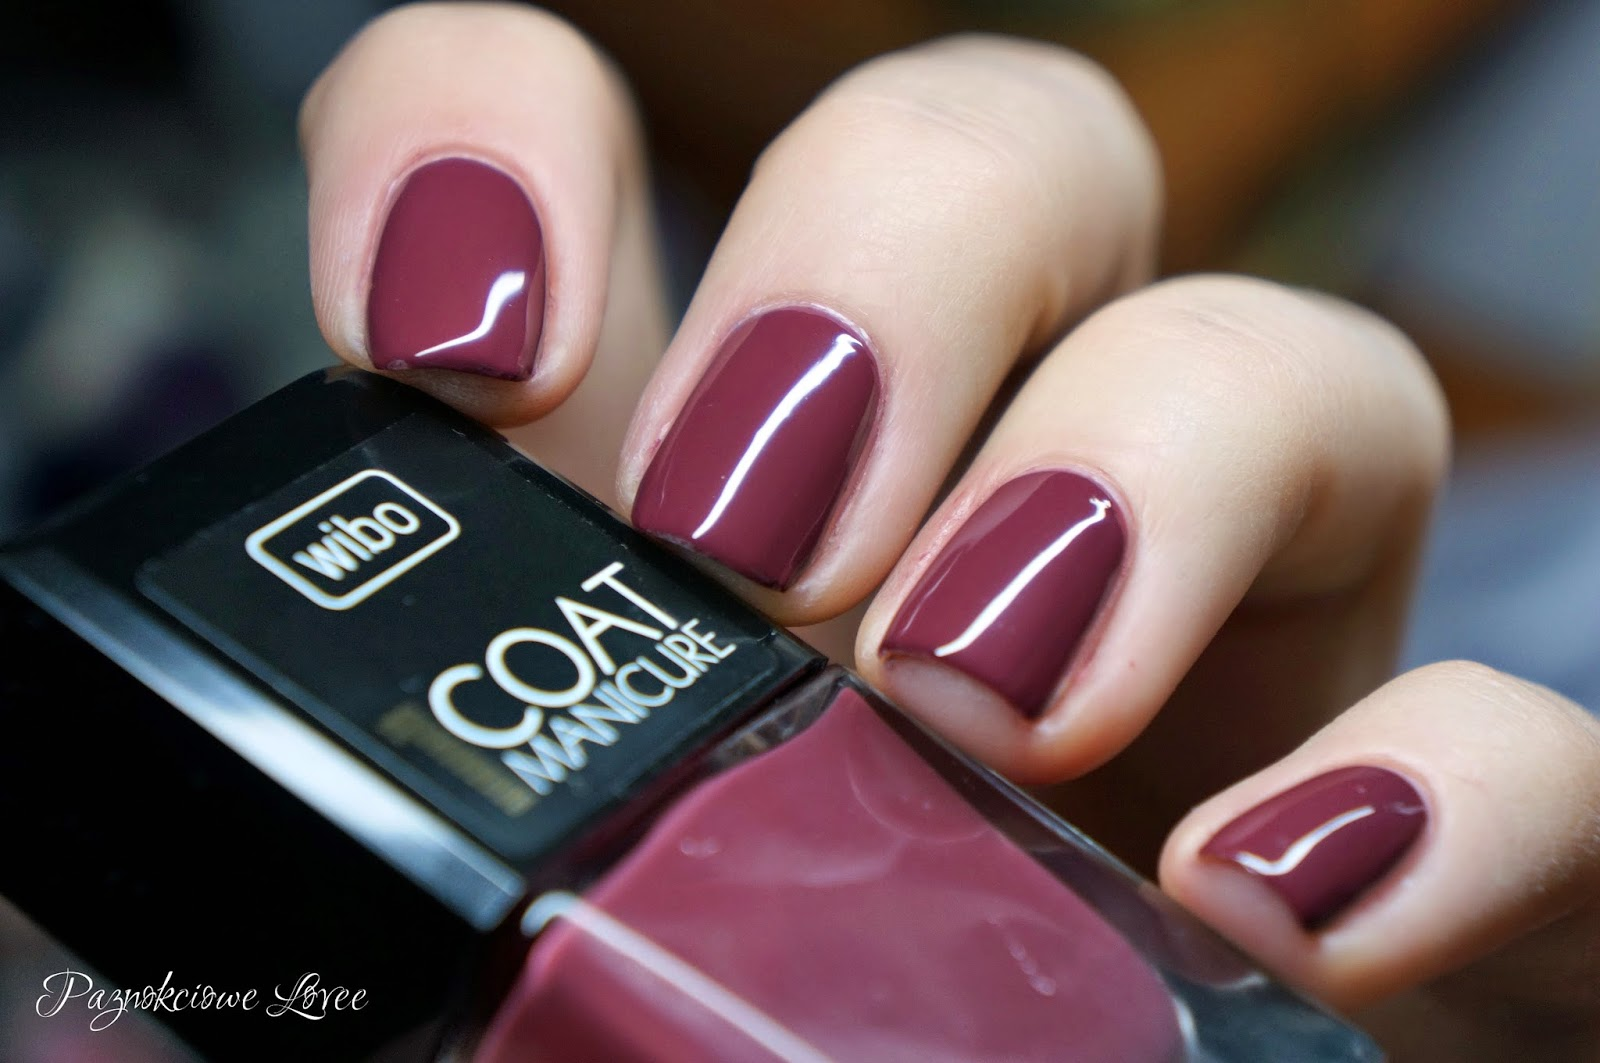 Marsala kolorem 2015 roku, czyli Wibo 1 coat manicure nr 14